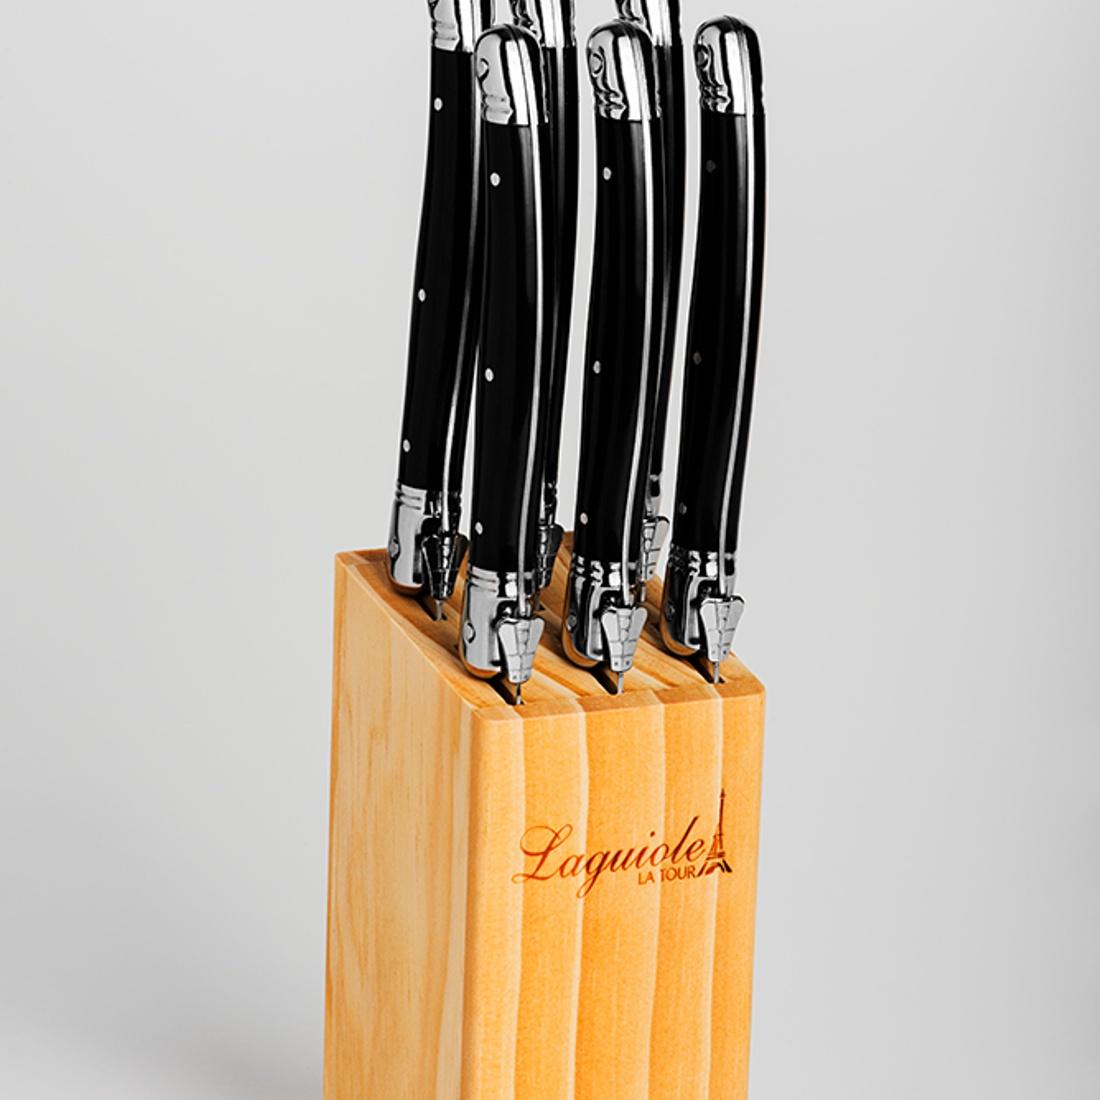 Laguiole luxury steak knives 6-set